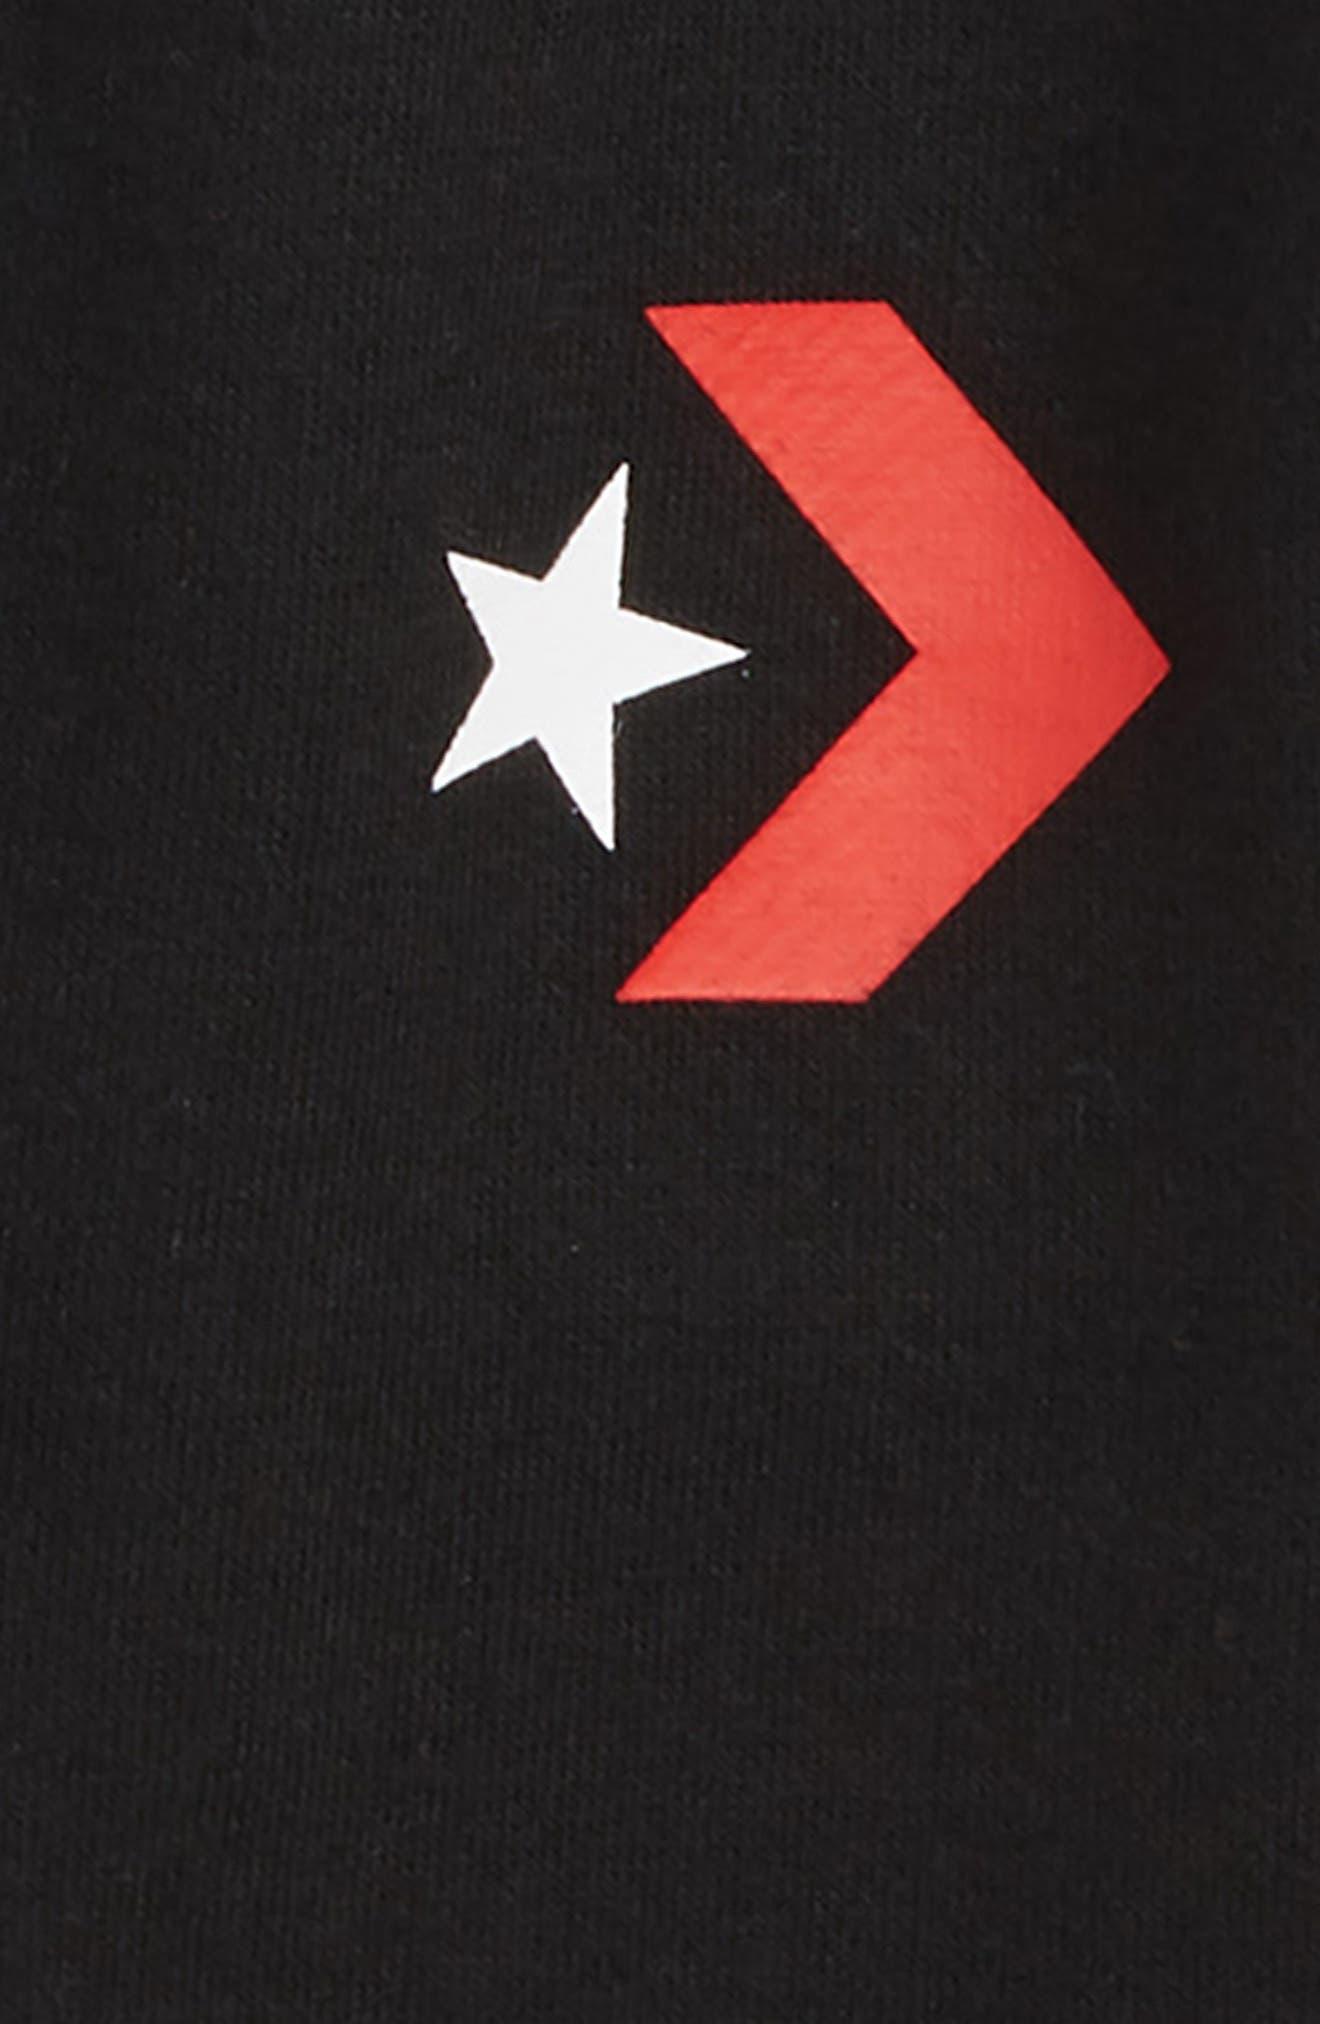 Star Chevron Graphic Shorts,                             Alternate thumbnail 2, color,                             BLACK